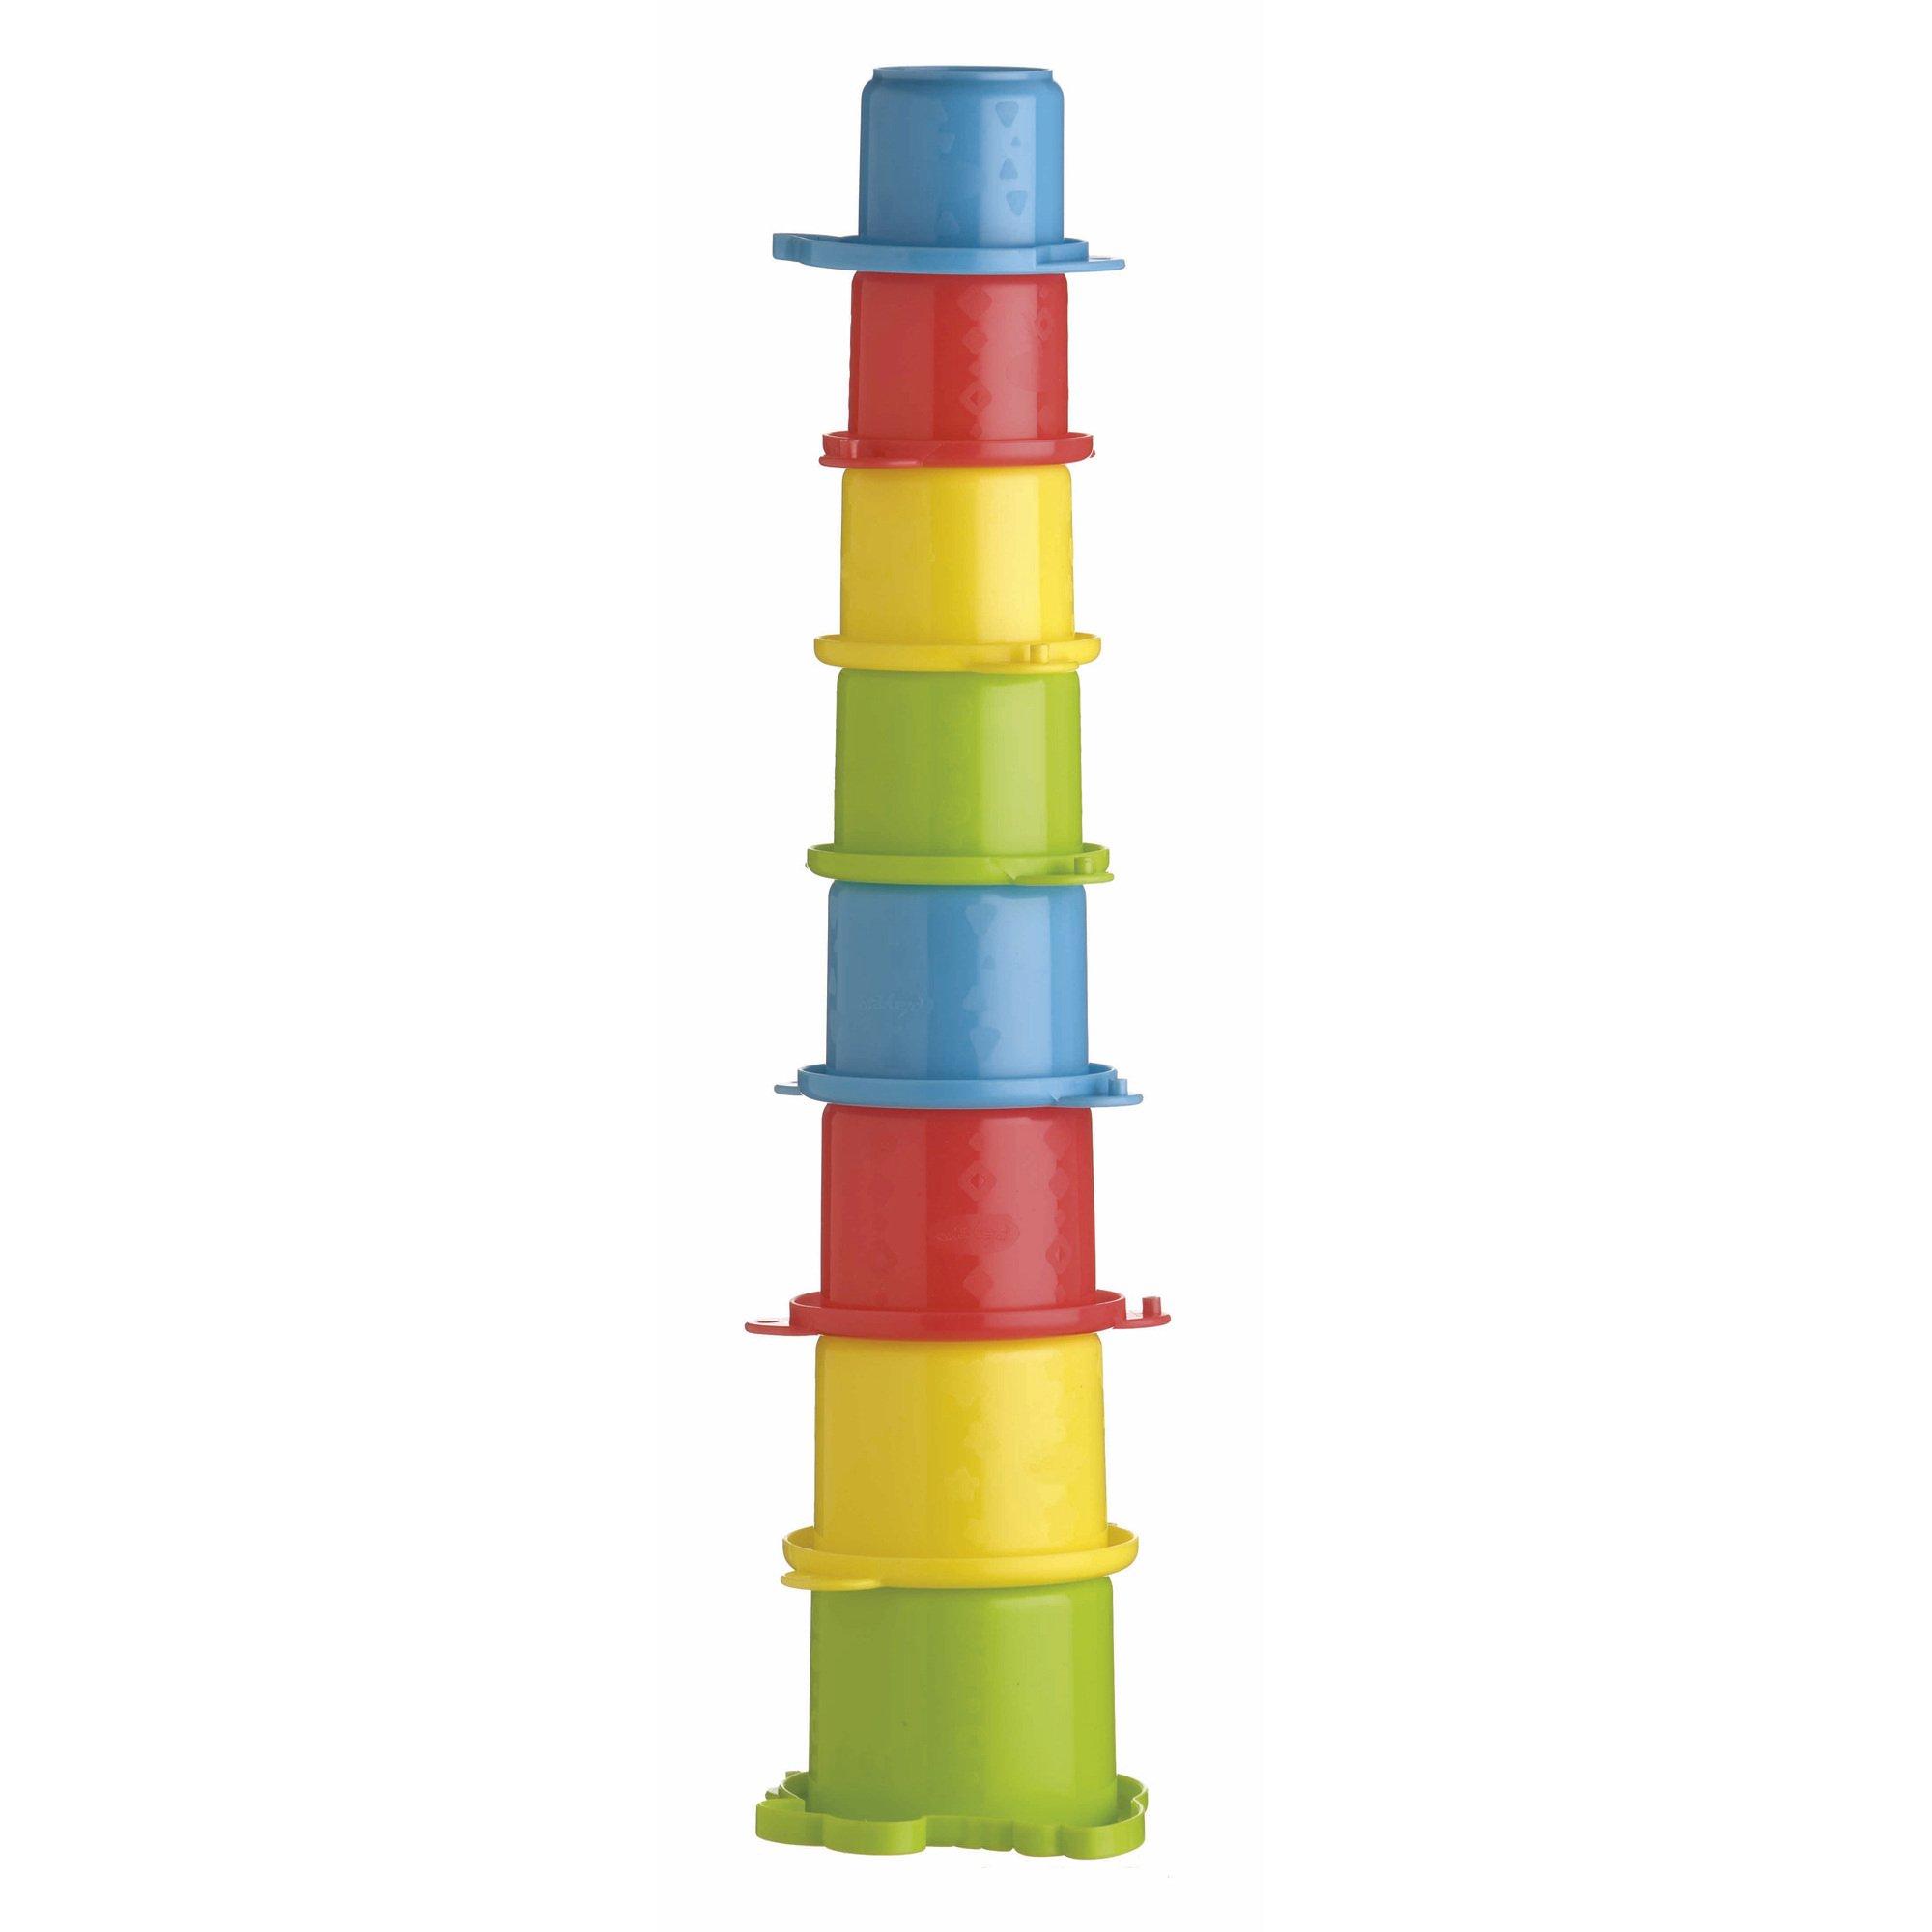 Фото - Развивающие игрушки Playgro Стаканчики подвесные игрушки playgro верблюд